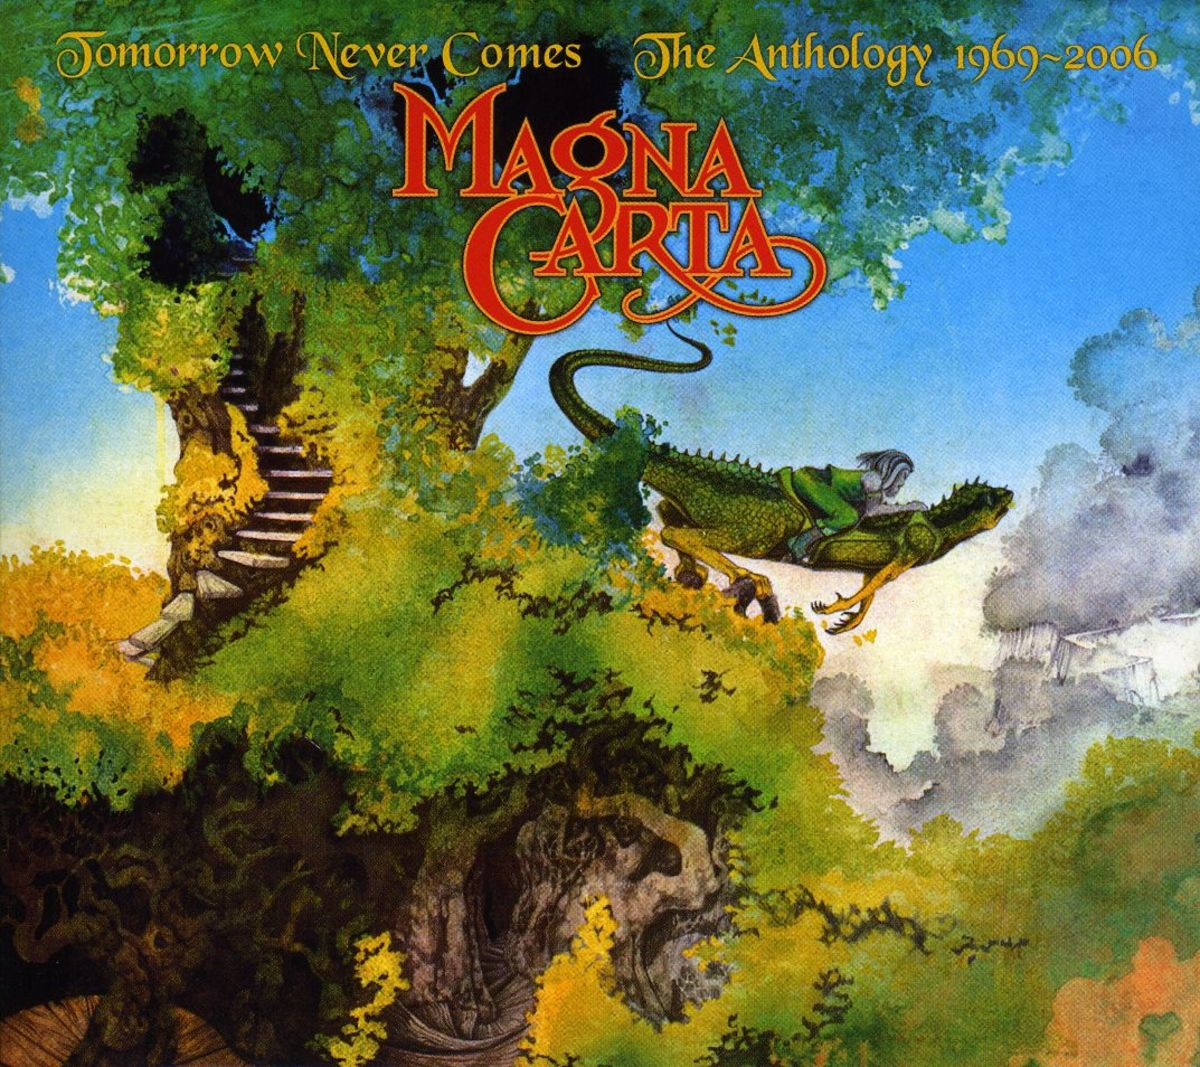 "Magna Carte ""Tomorrow Never Comes"" Repertoire Records REPUK 1103 Compact Disc UK Pressing (2007) CD Album Cover Art & Design by Roger Dean"